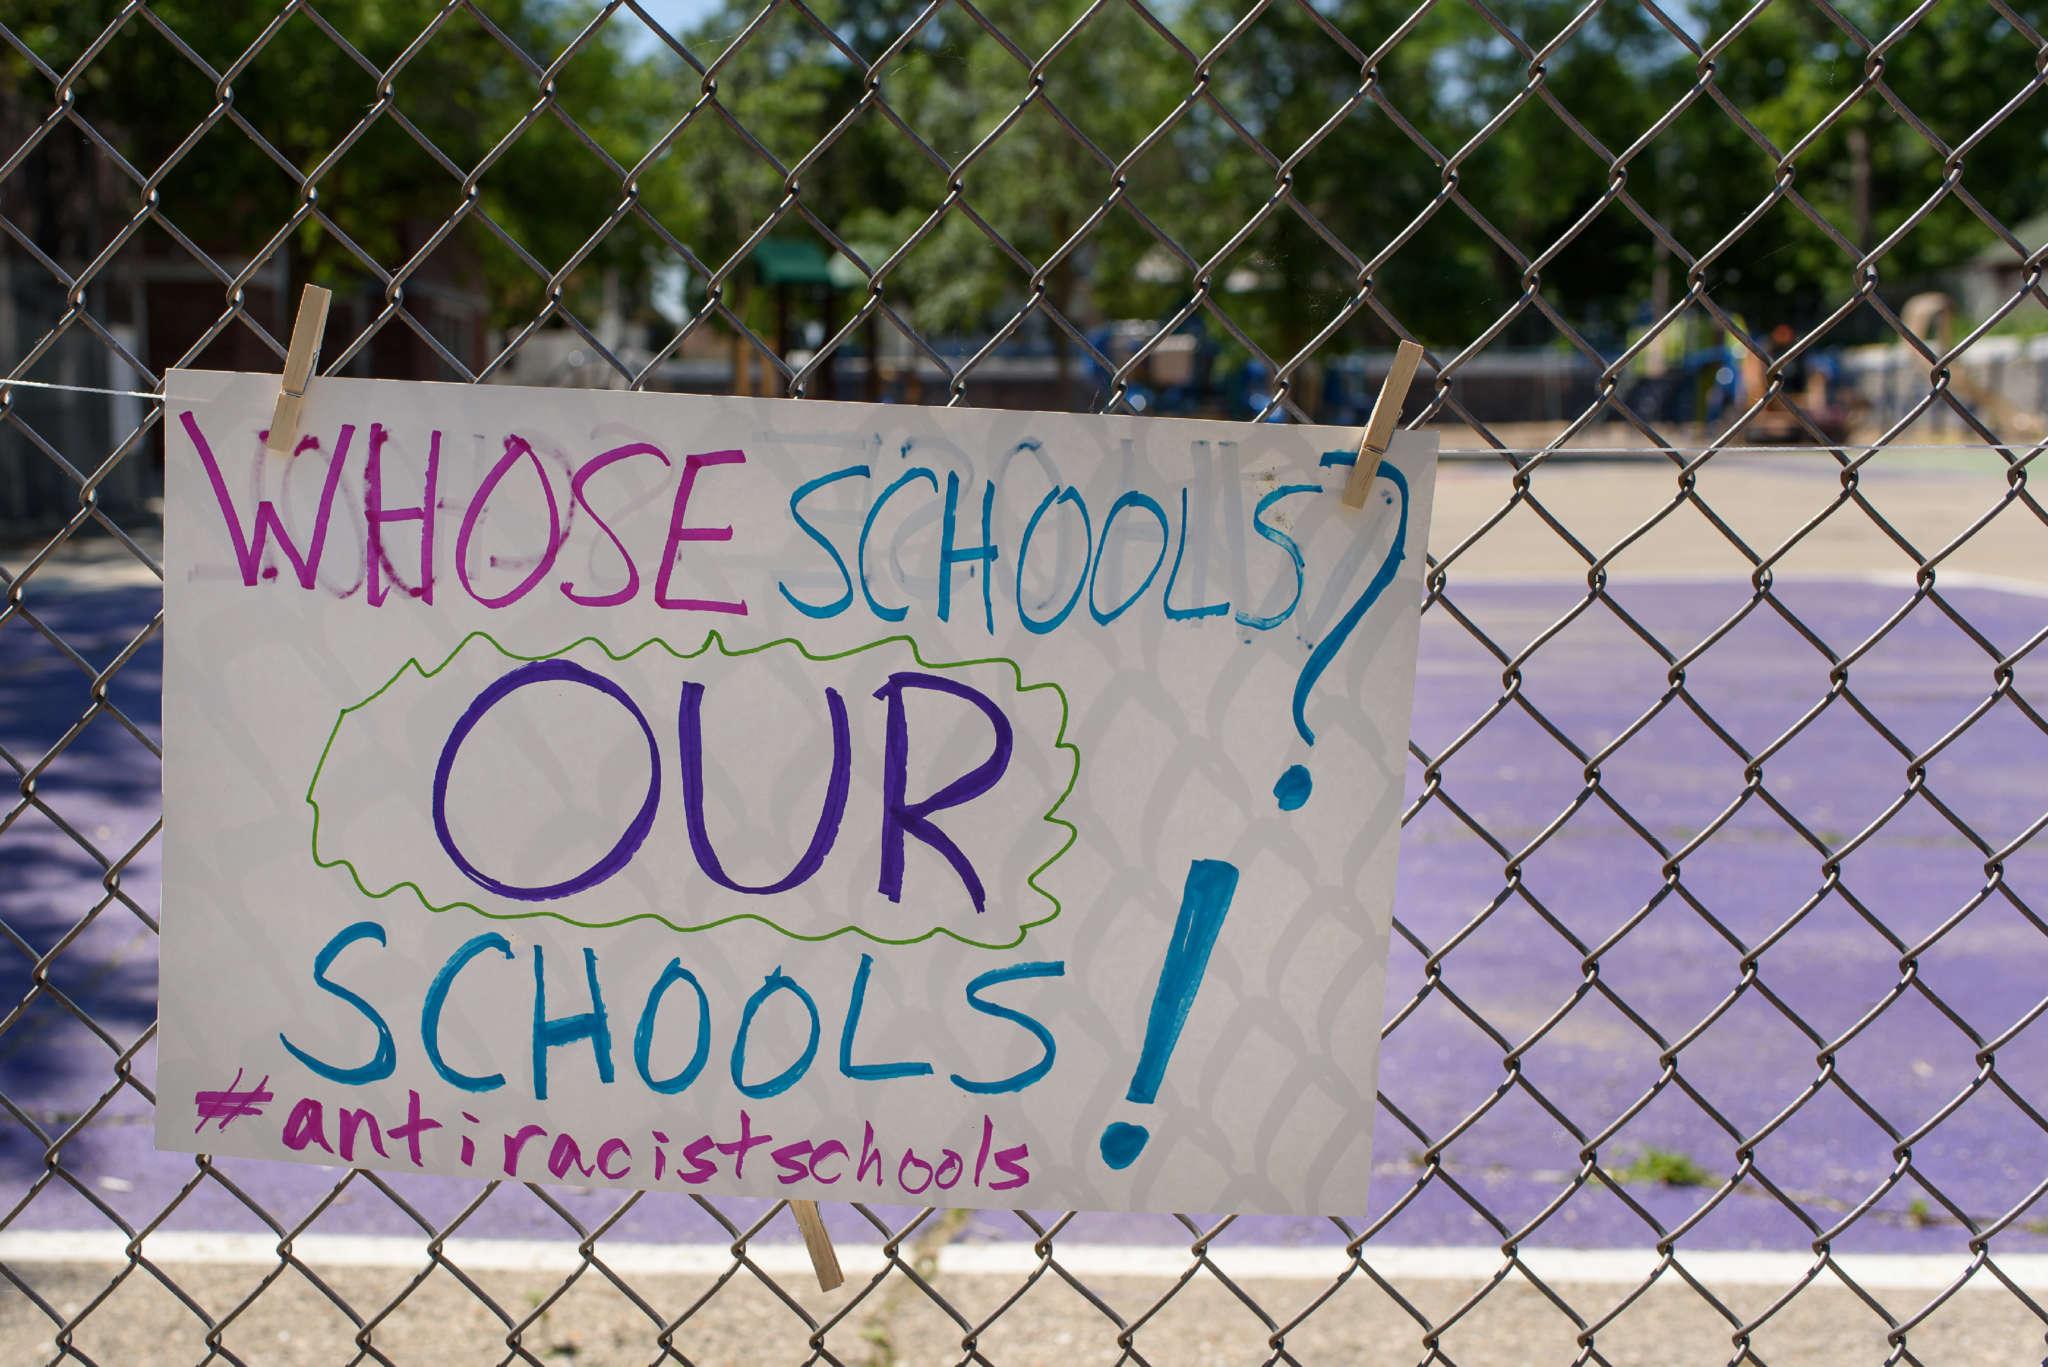 antiracist school sign